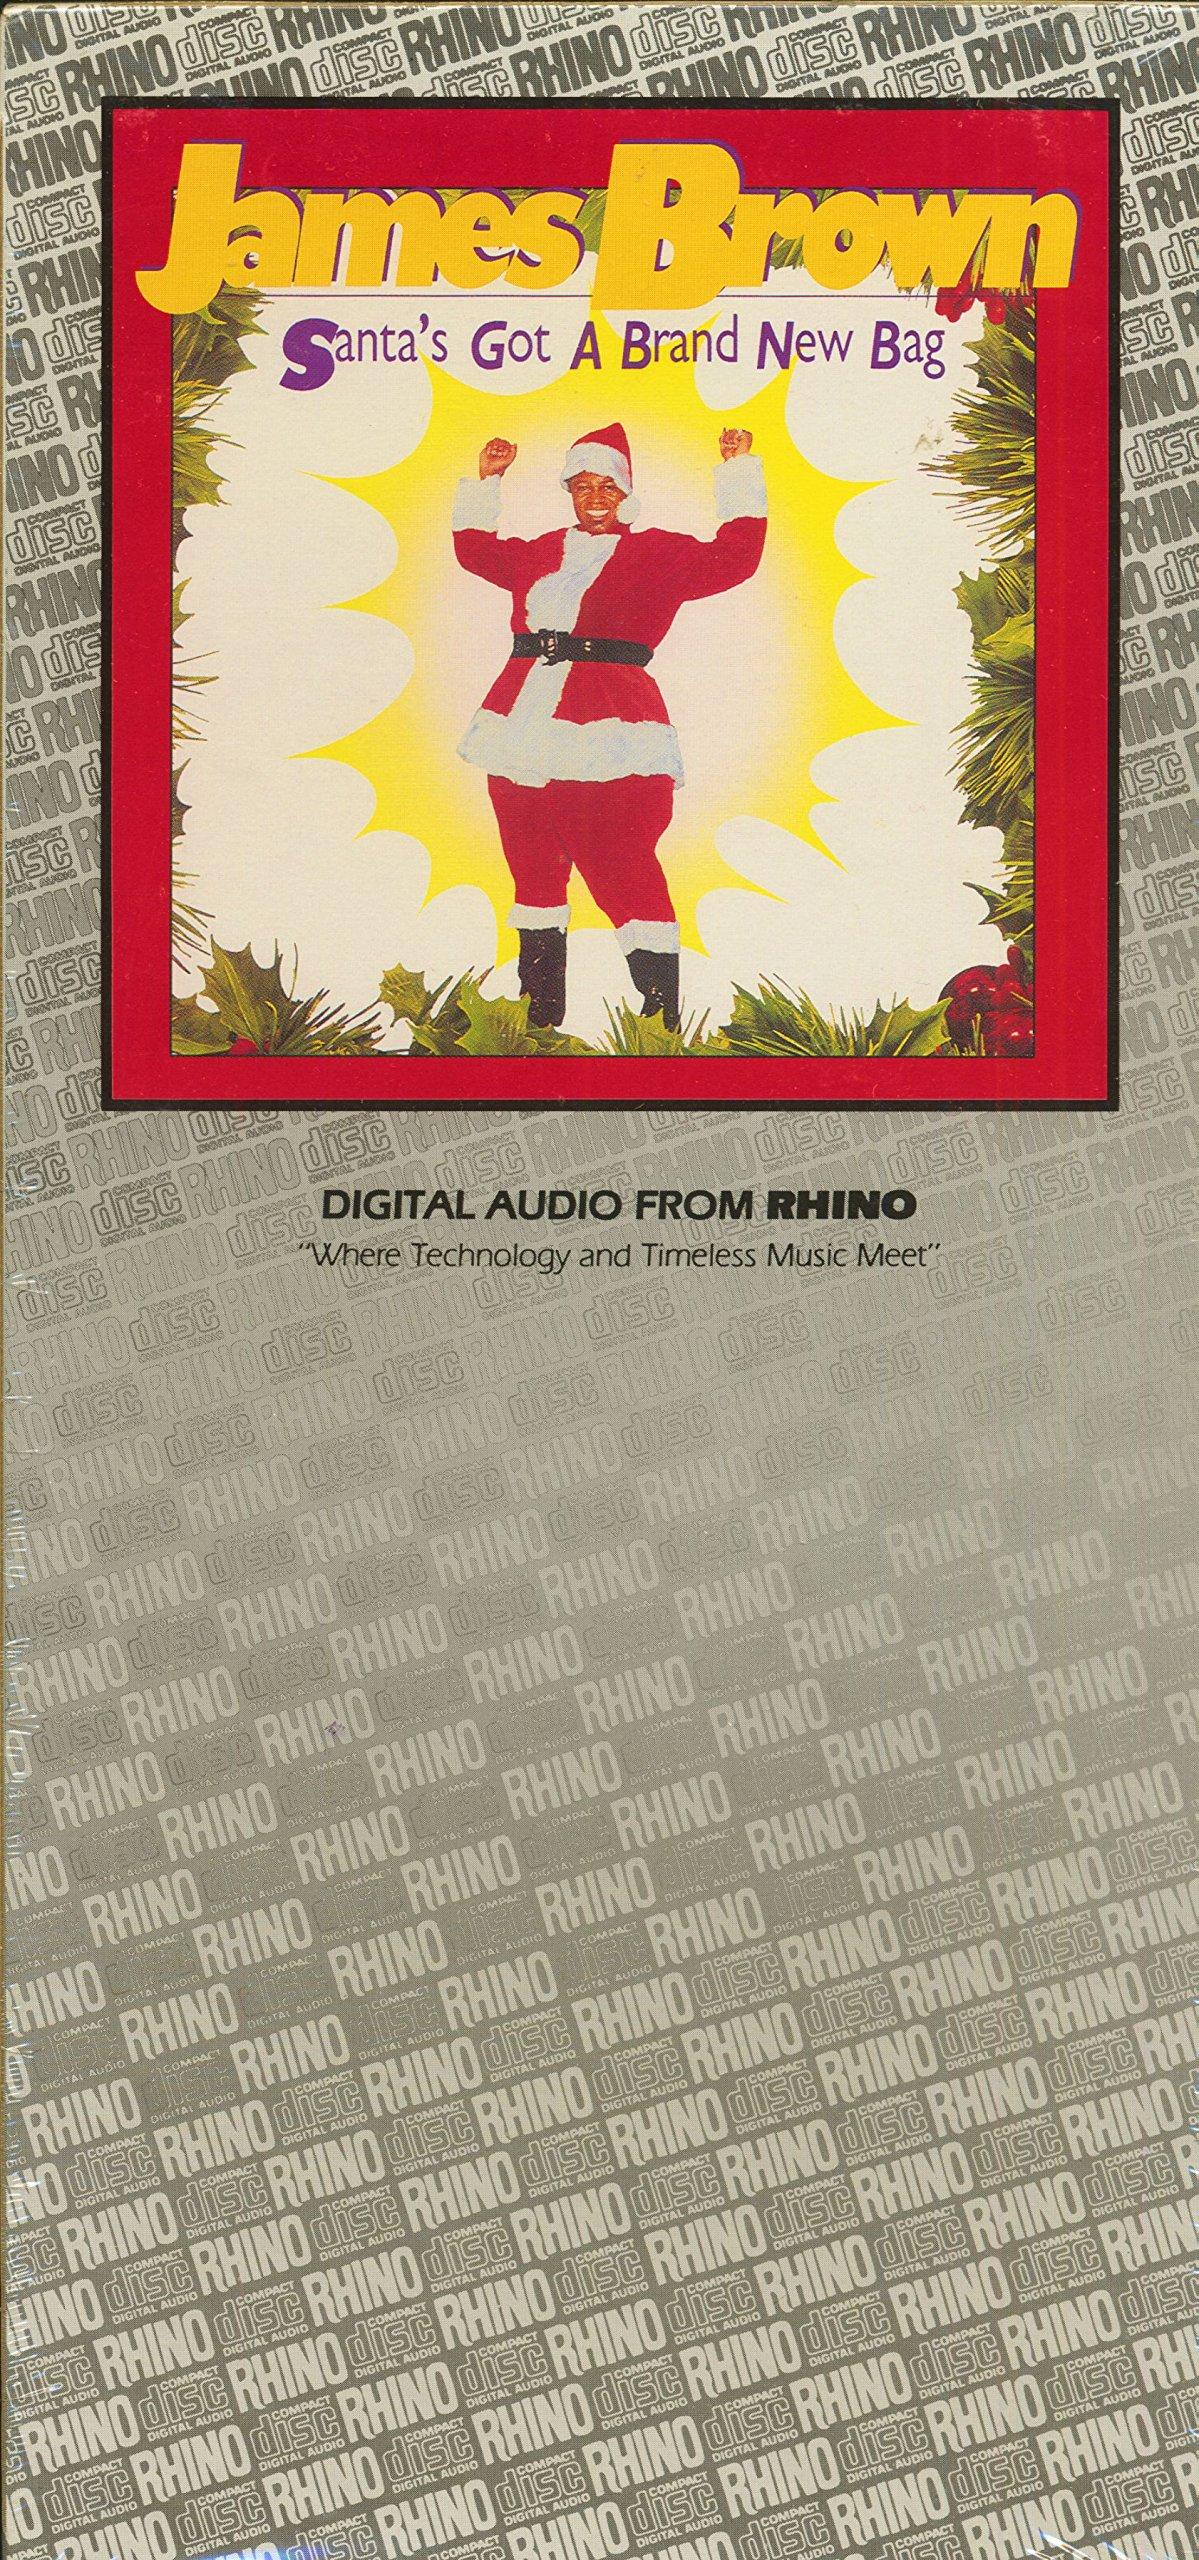 James Brown – Santas Got A Brand New Bag (1988) [FLAC]